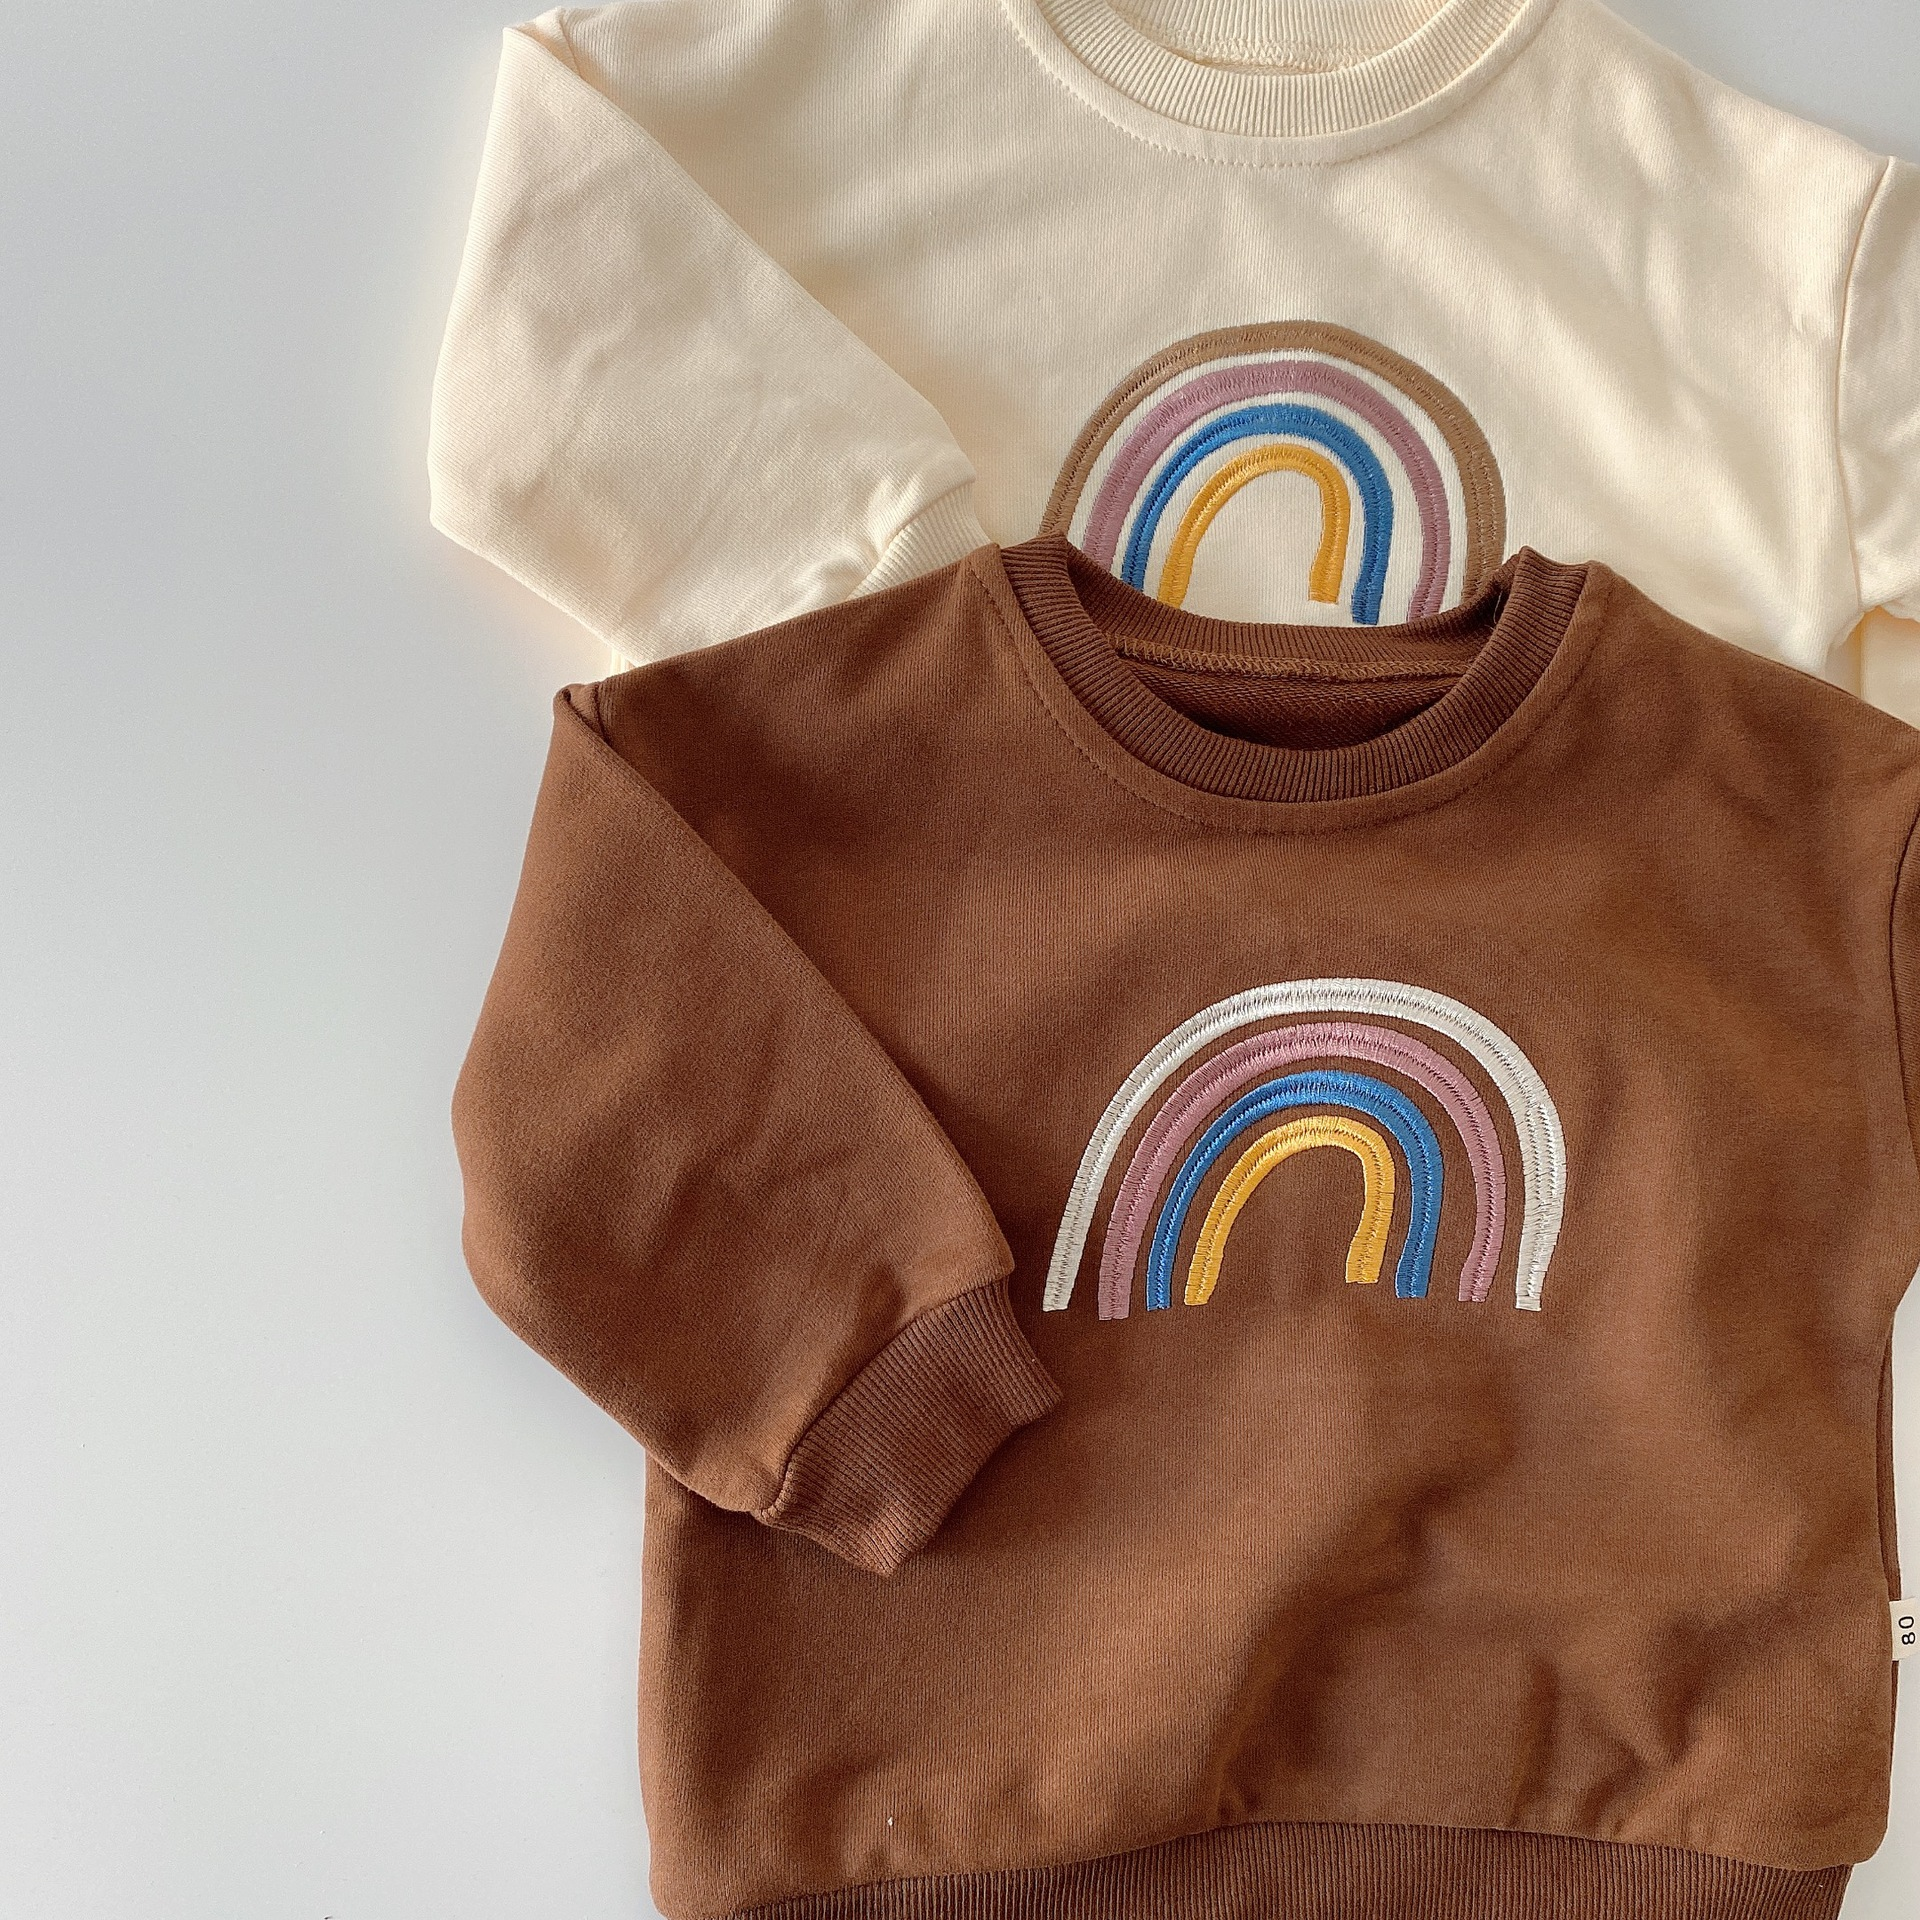 Autumn Baby Girls Embroidery Rainbow Sweatshirts Long Sleeve Tops Kids Toddler Boys Pullover Sweatshirt Rainbow T-shirt Clothes 1